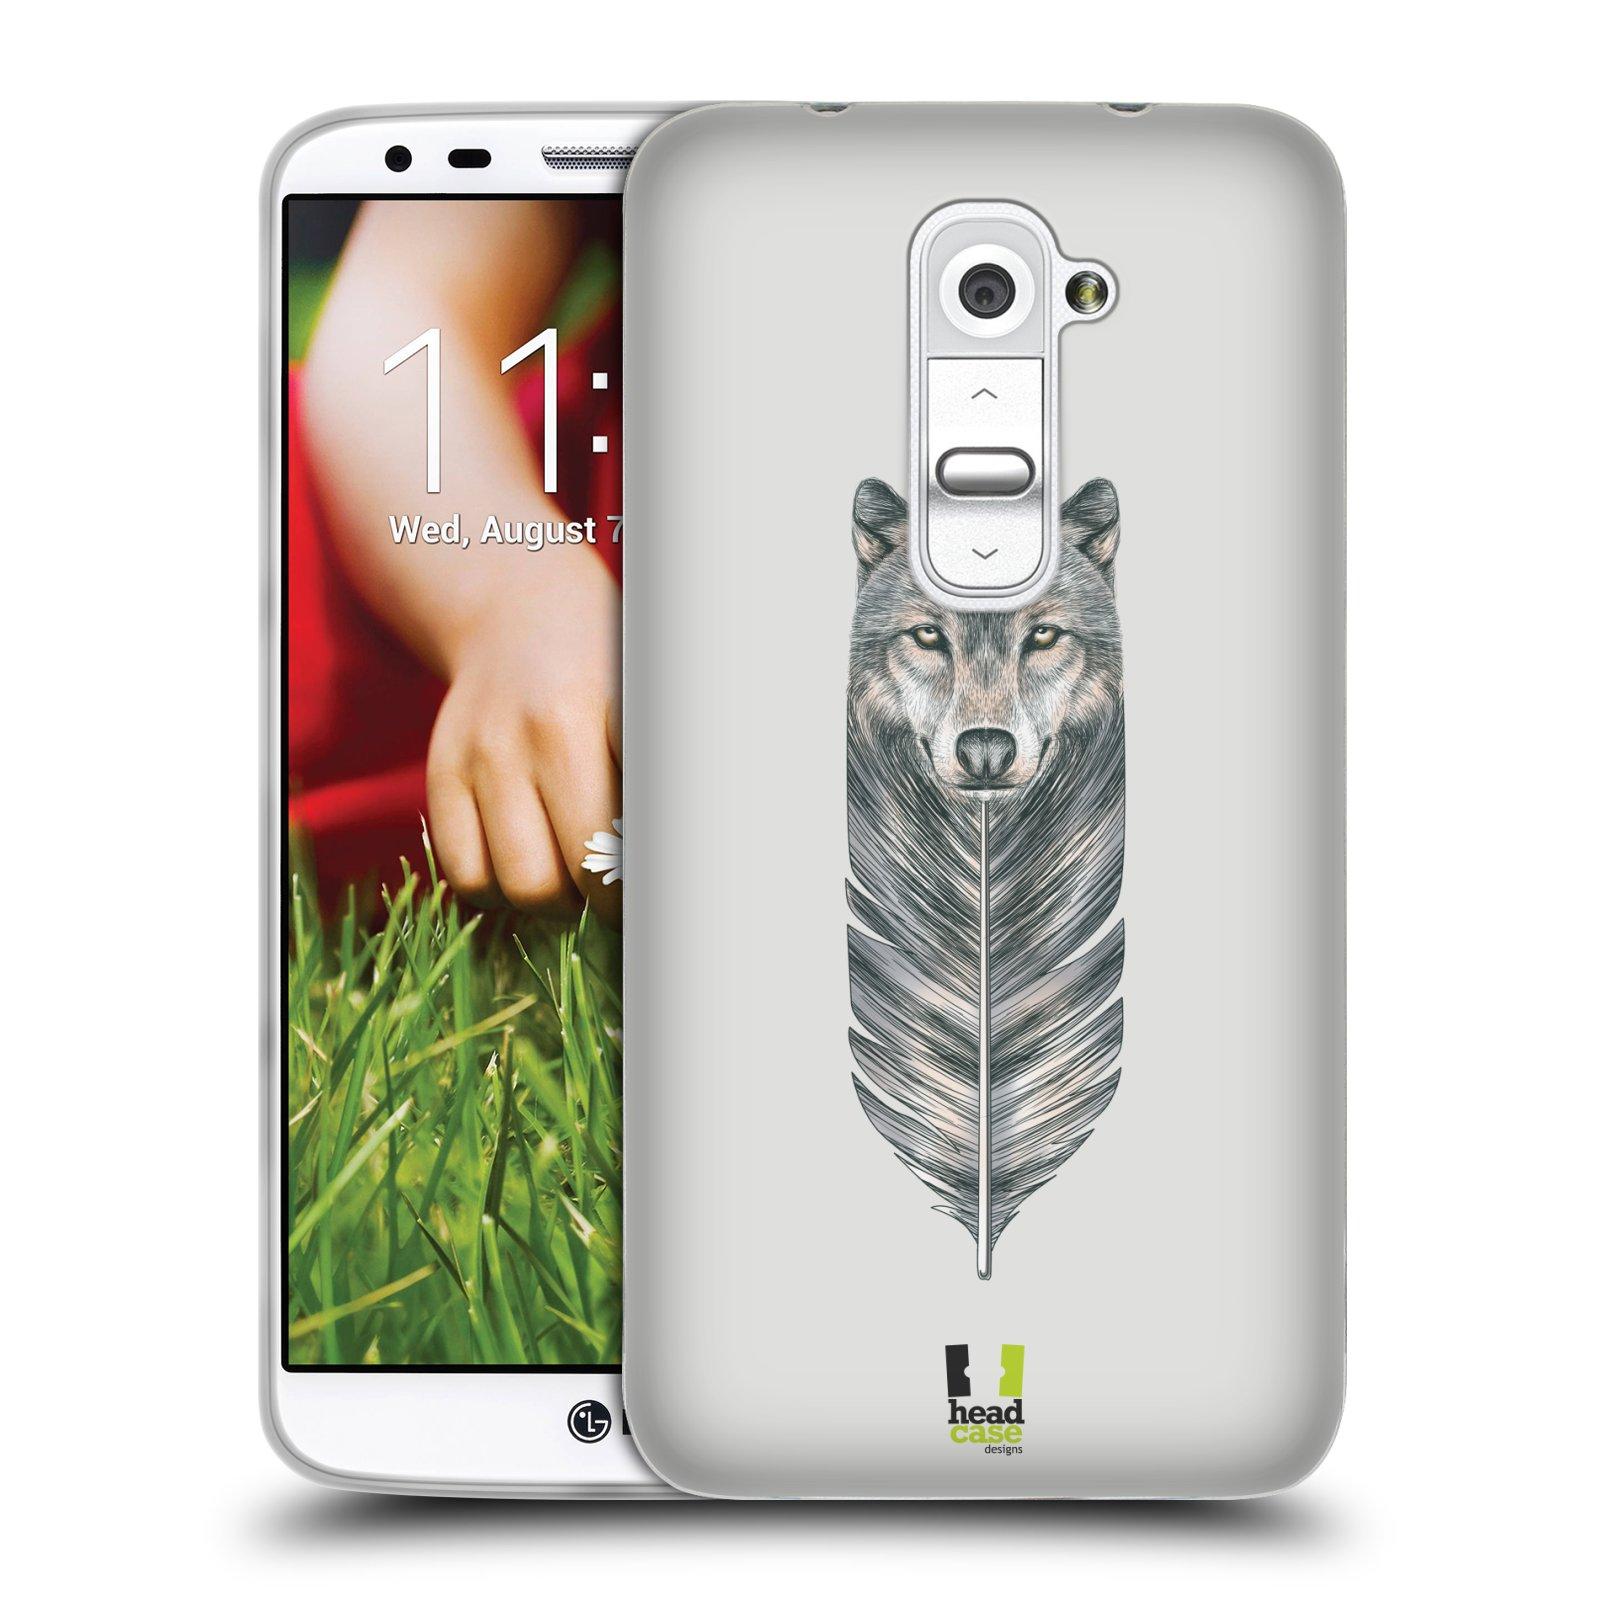 HEAD CASE silikonový obal na mobil LG G2 vzor zvířecí pírka vlk